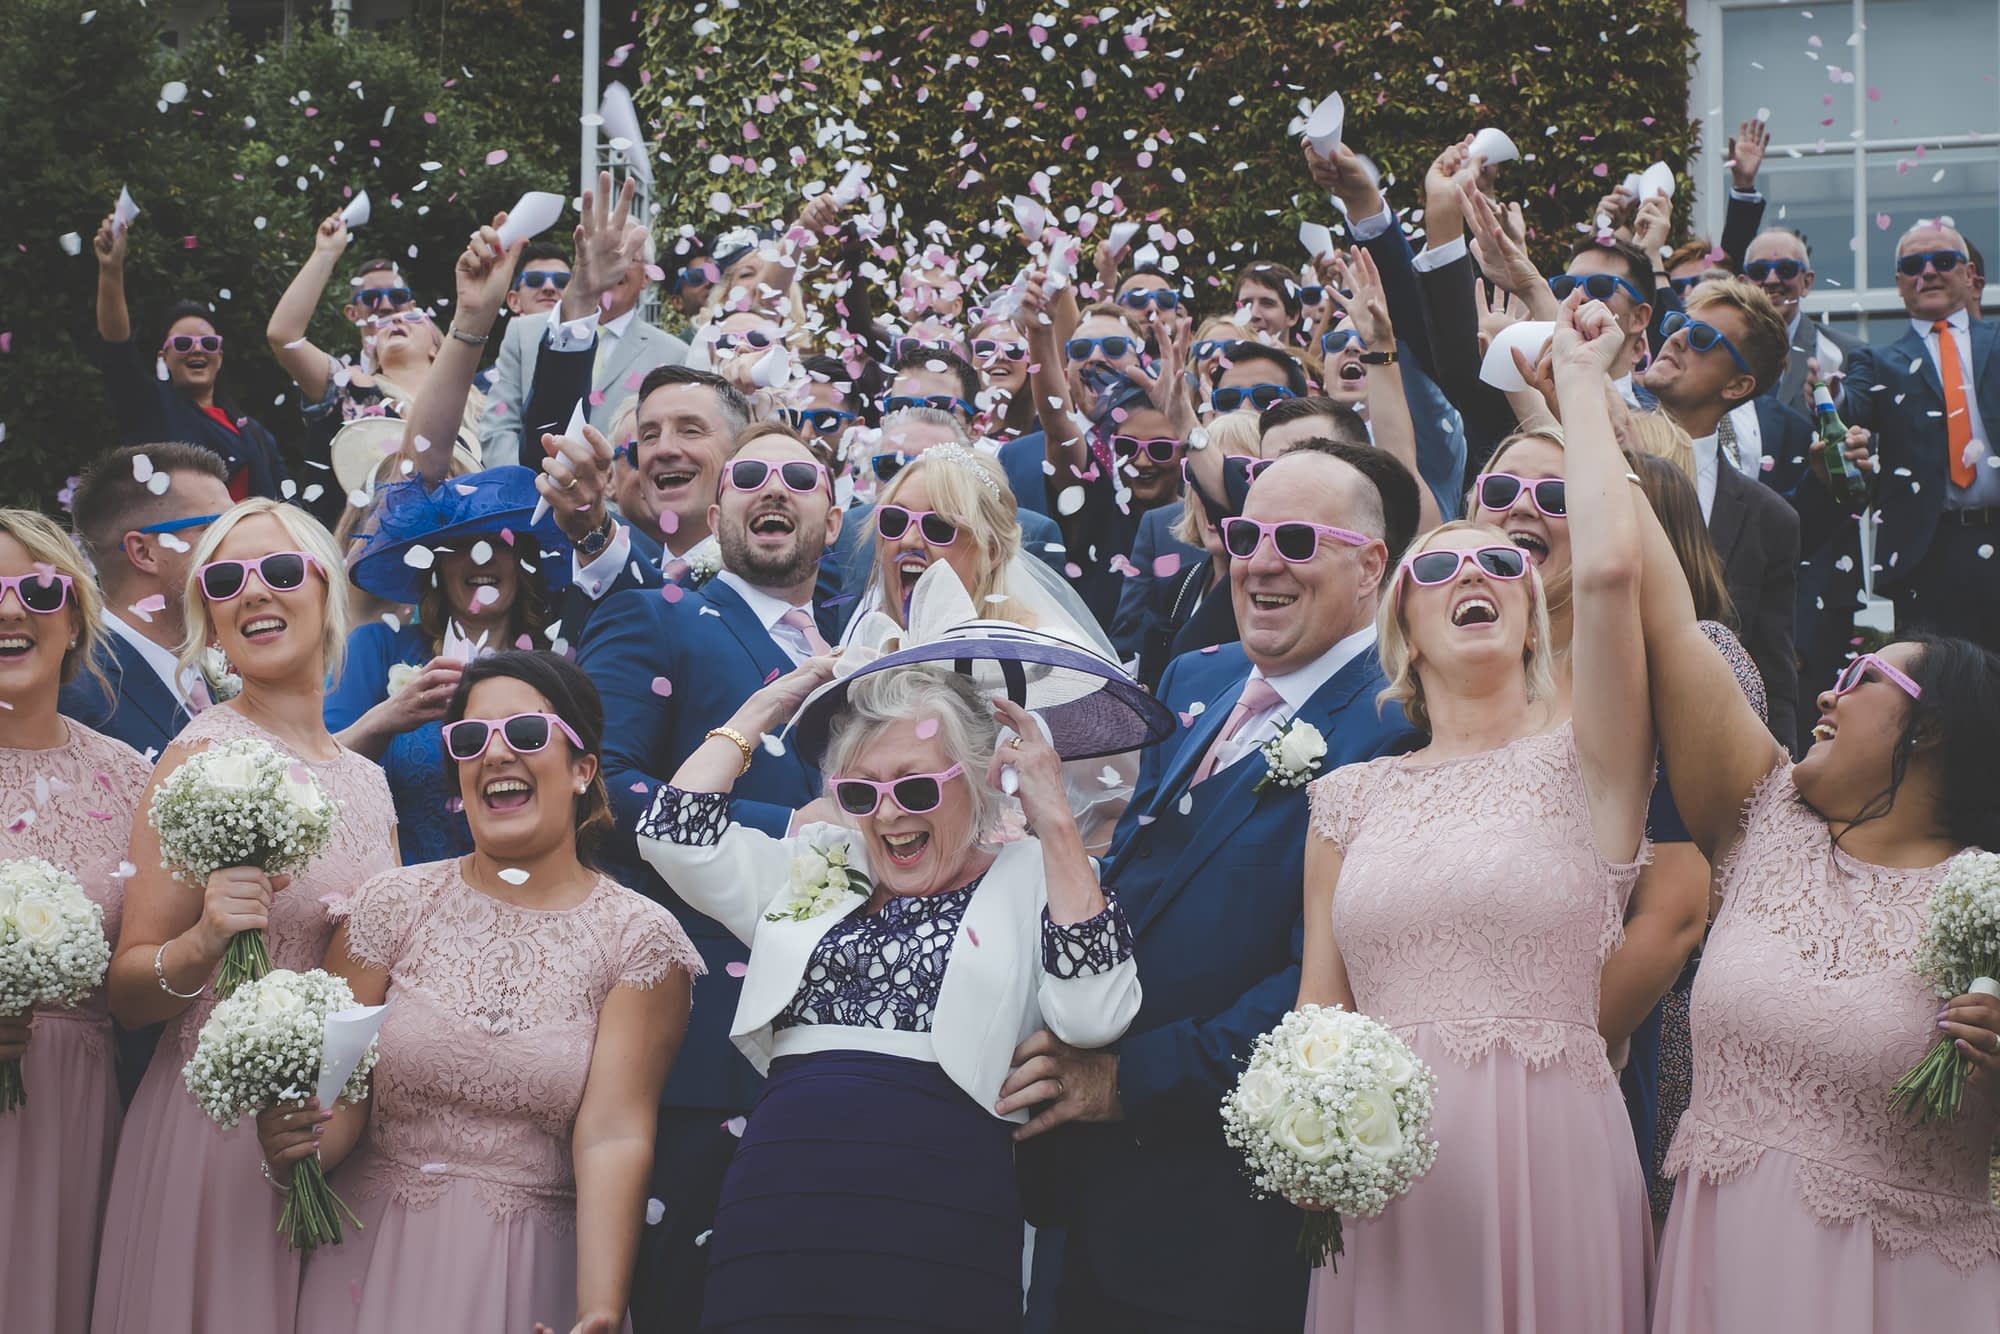 wedding group throws confetti